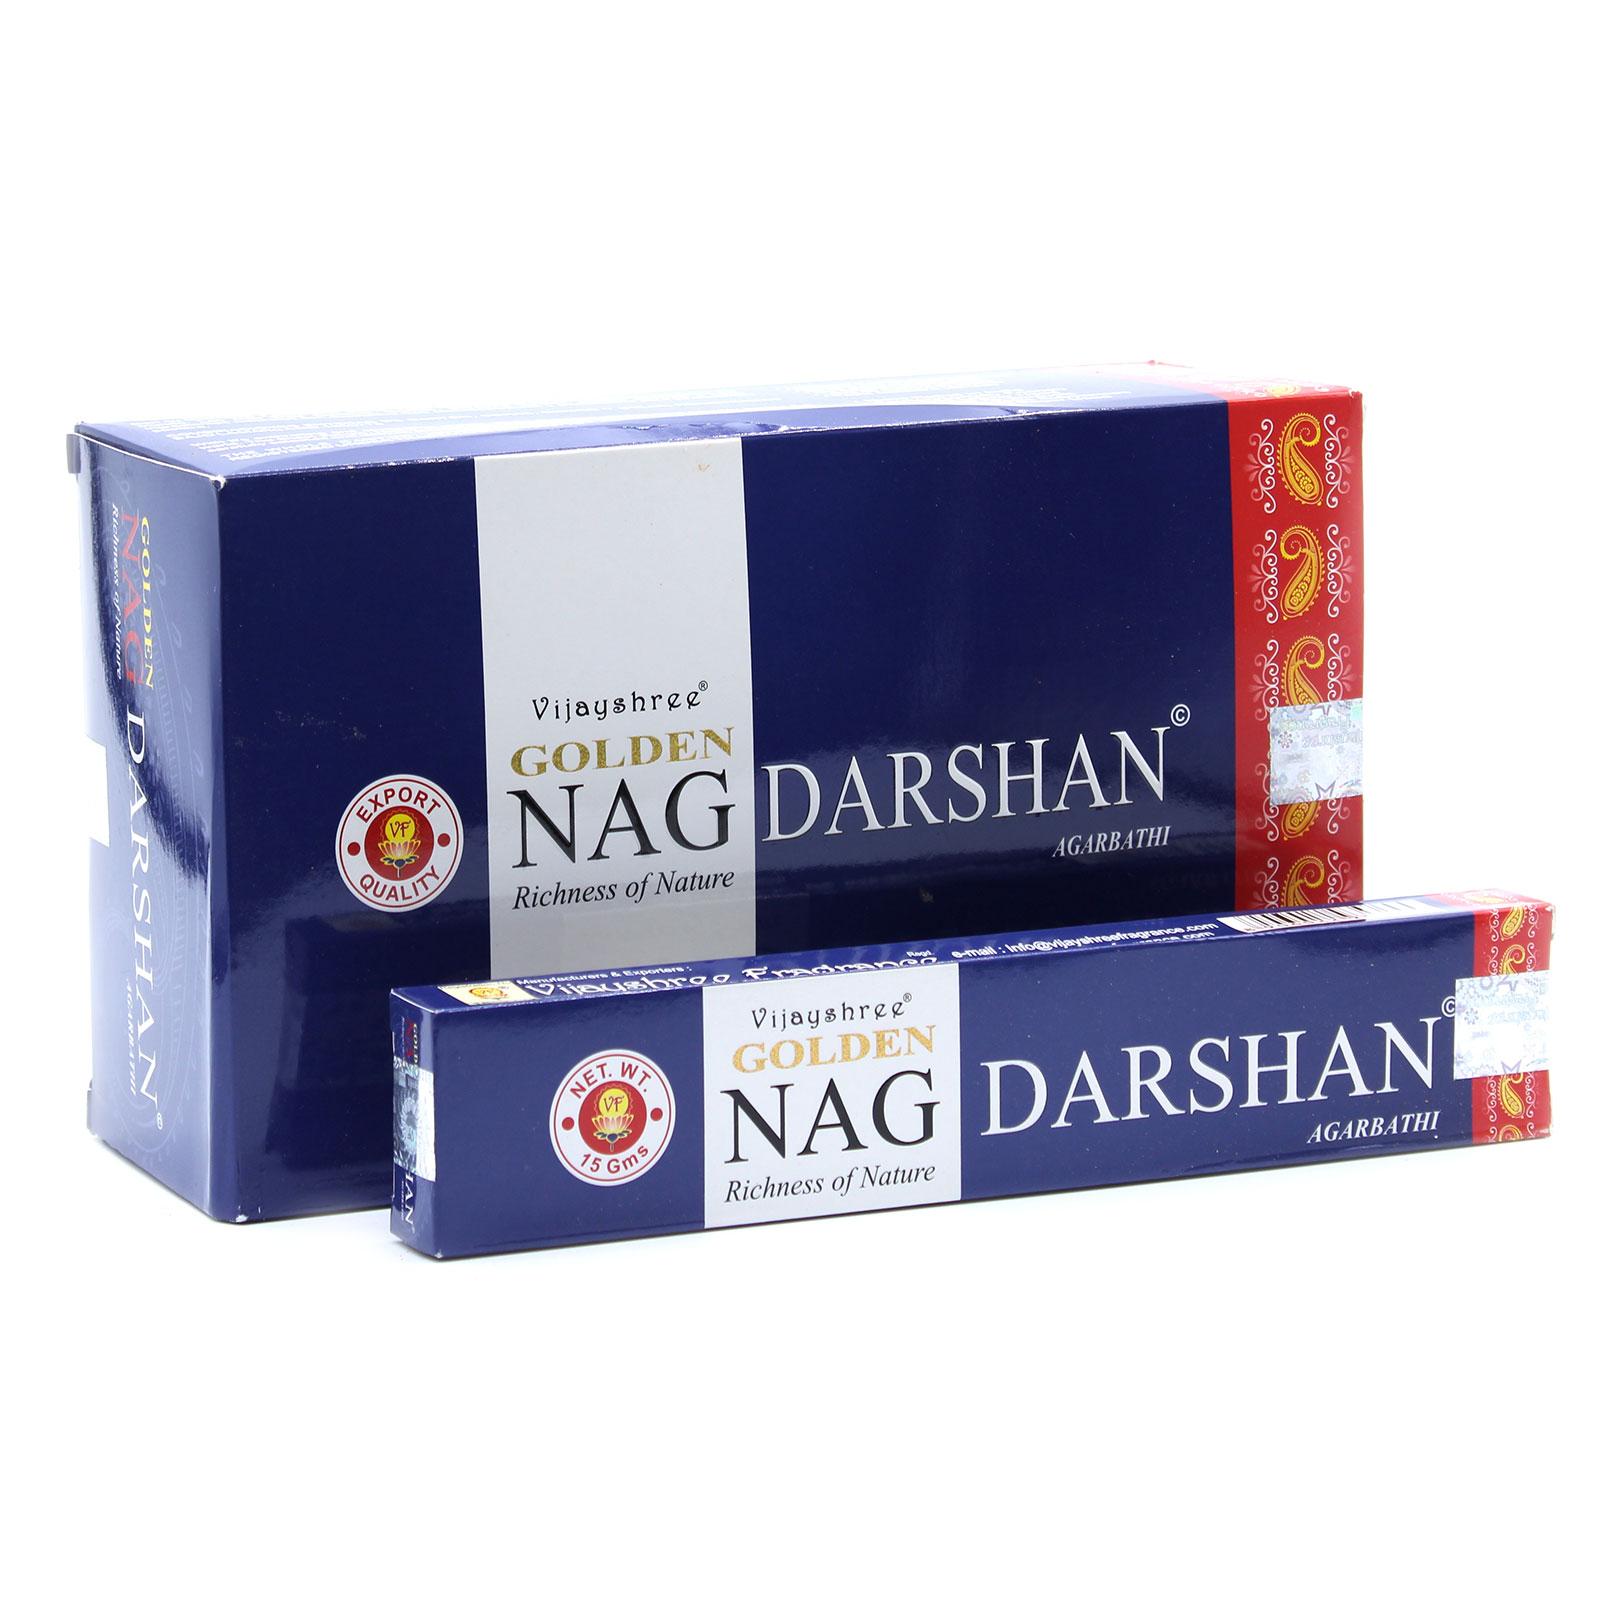 15g Golden Nag Darshan Incense